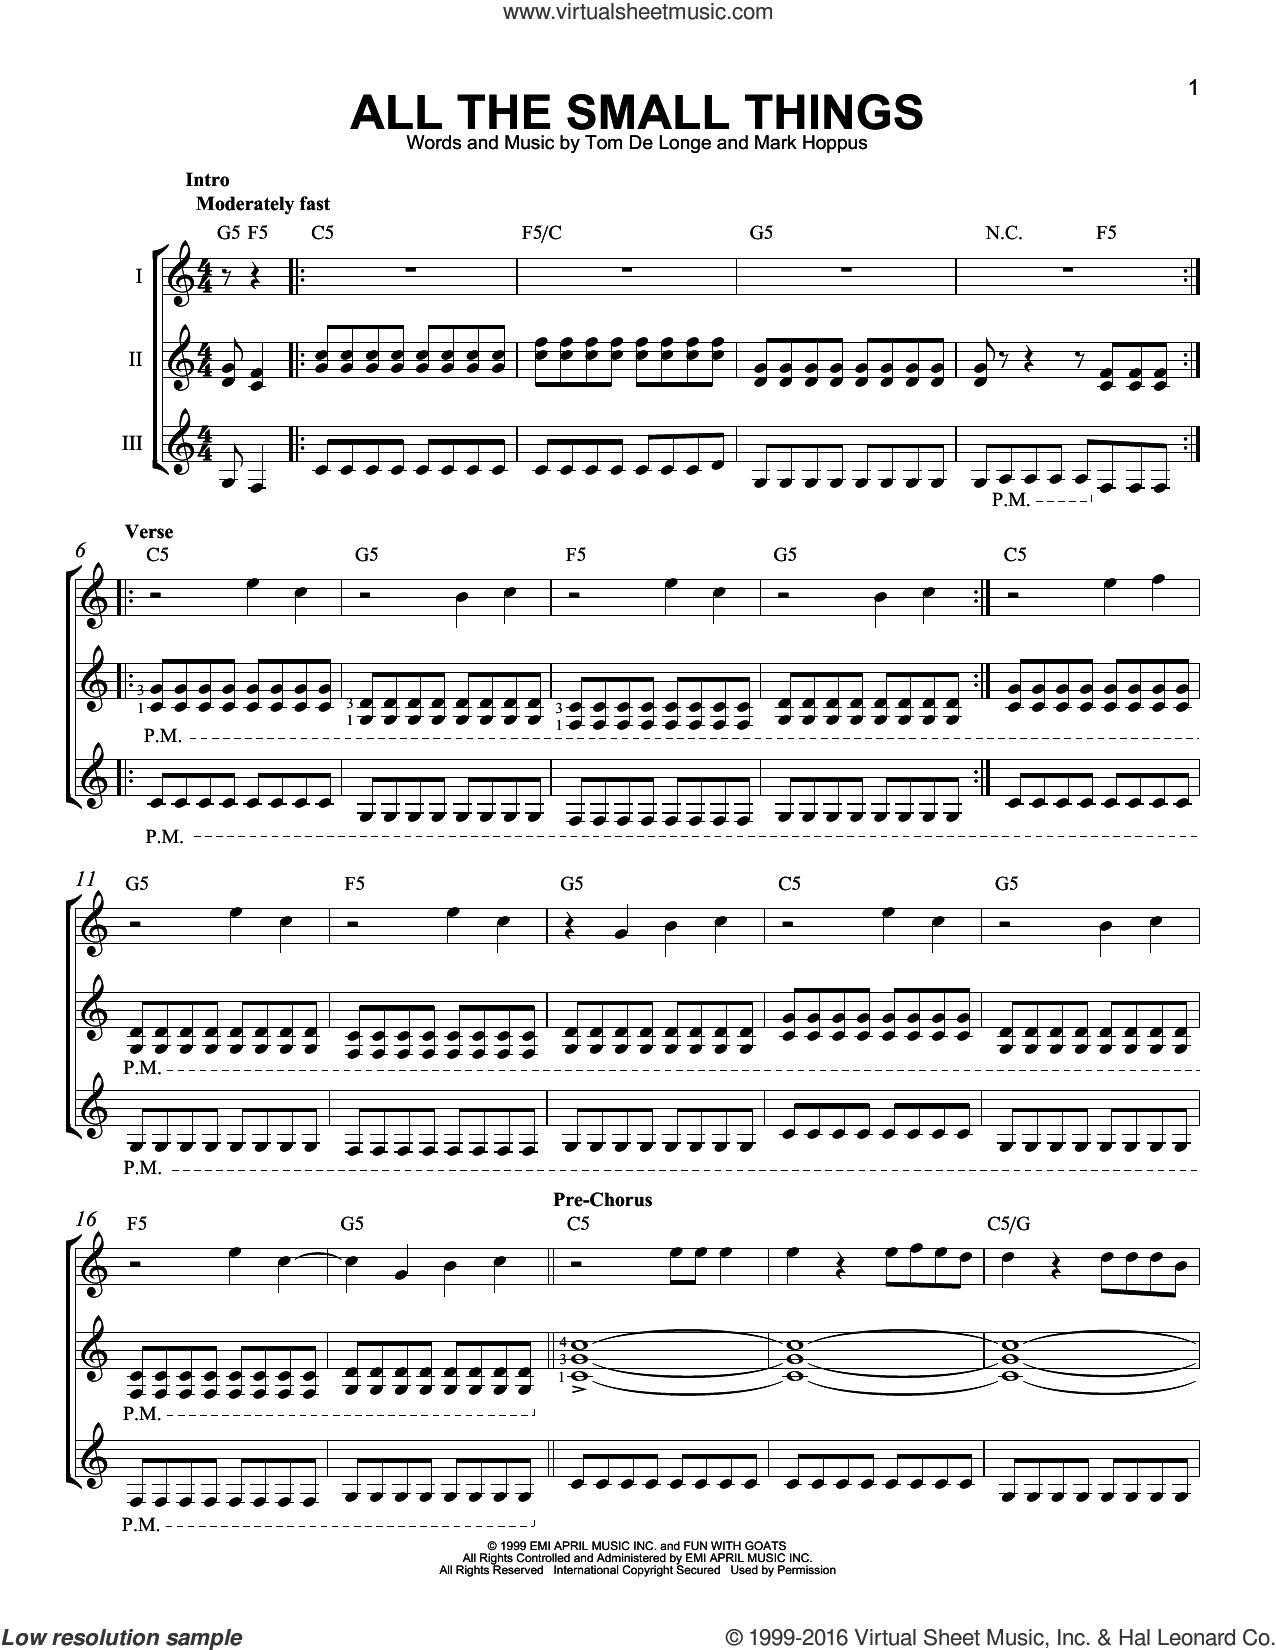 All The Small Things sheet music for guitar ensemble by Blink 182, Mark Hoppus, Tom DeLonge and Travis Barker, intermediate skill level